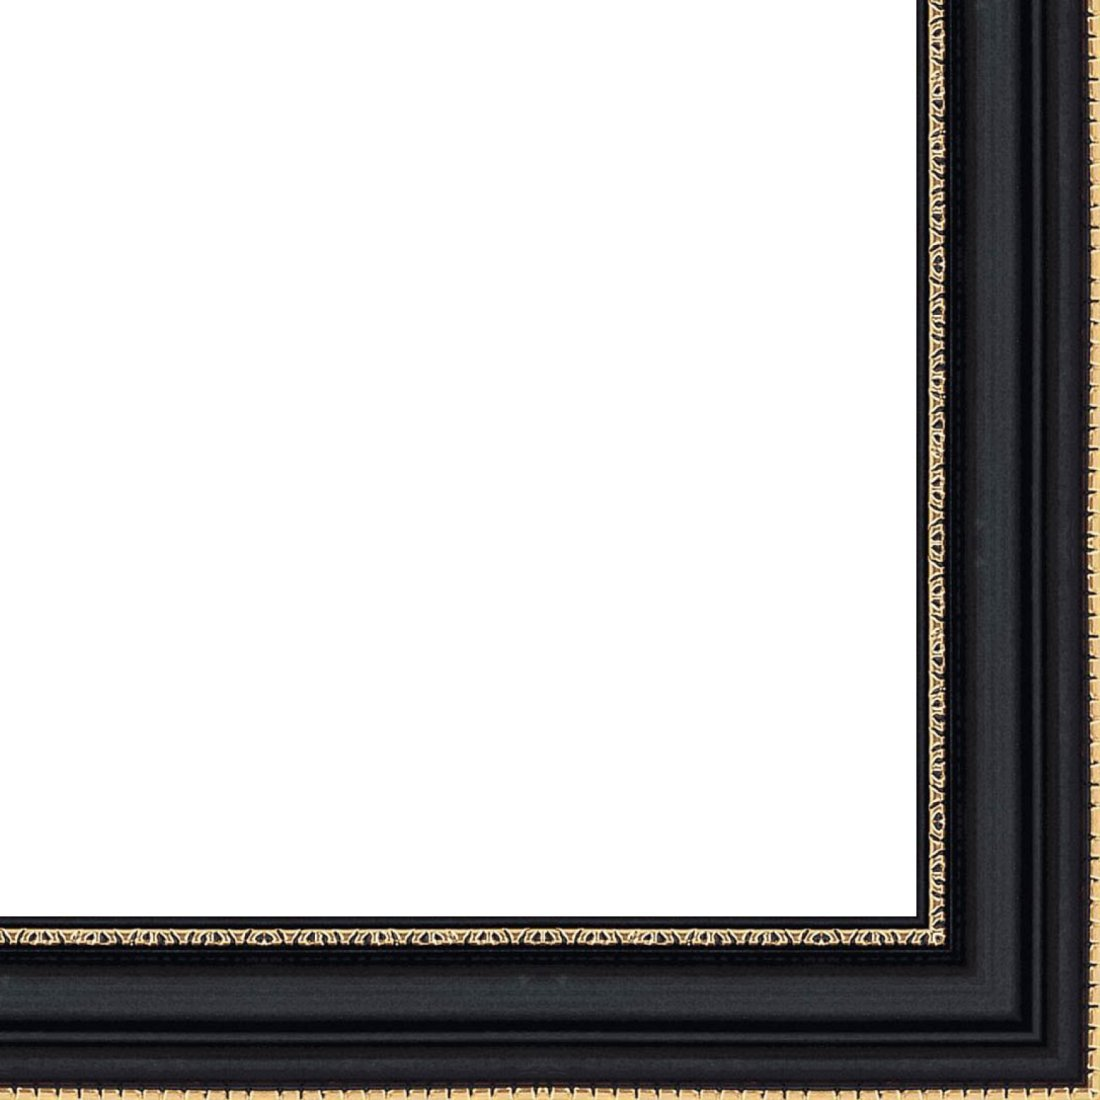 Picture Frame Moulding (Wood) 18ft bundle - Contemporary Black Finish - 0.875'' width - 3/8'' rabbet depth